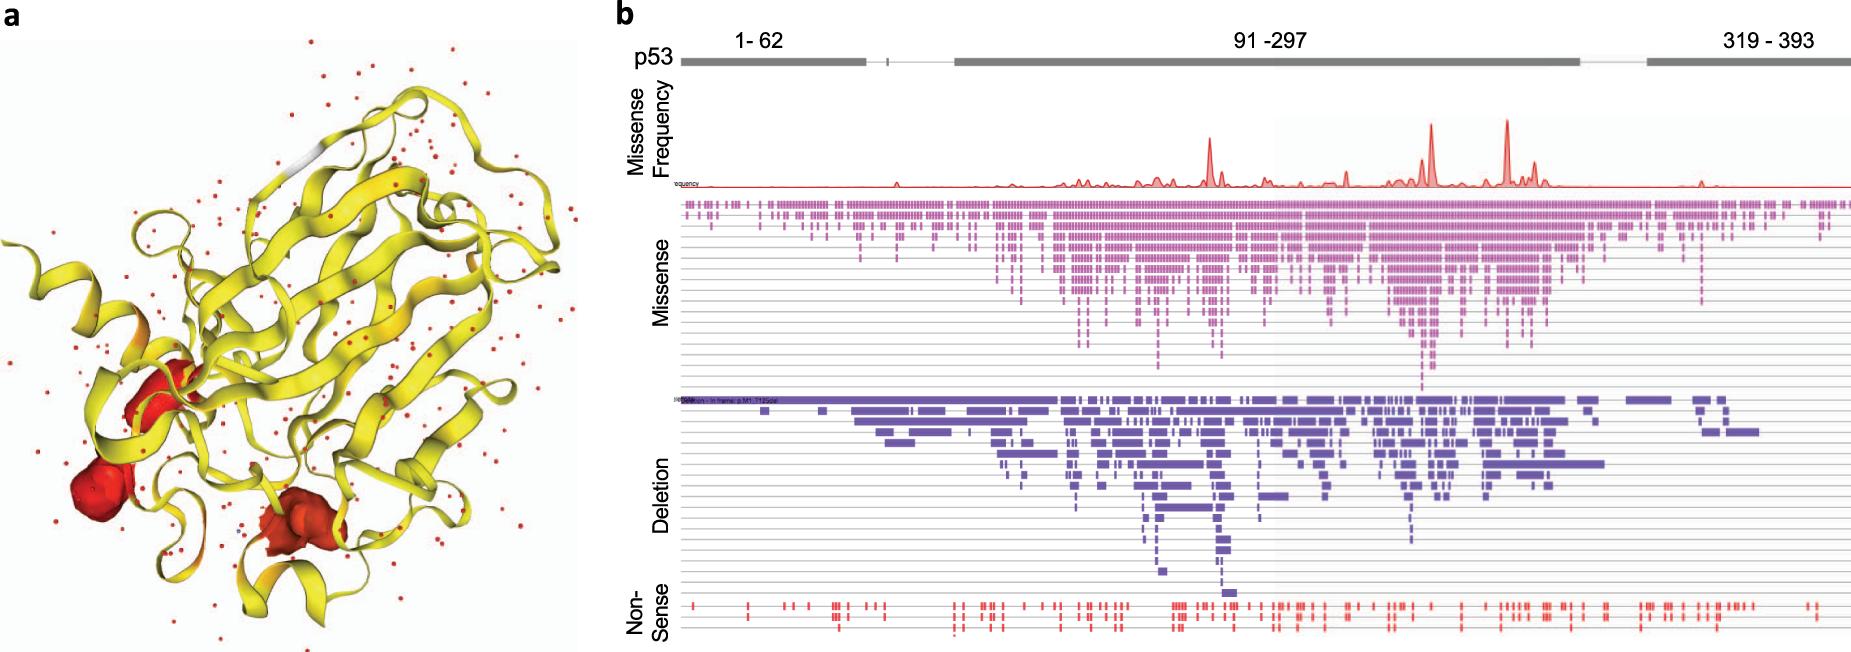 How mutant p53 empowers Foxh1 fostering leukaemogenesis?